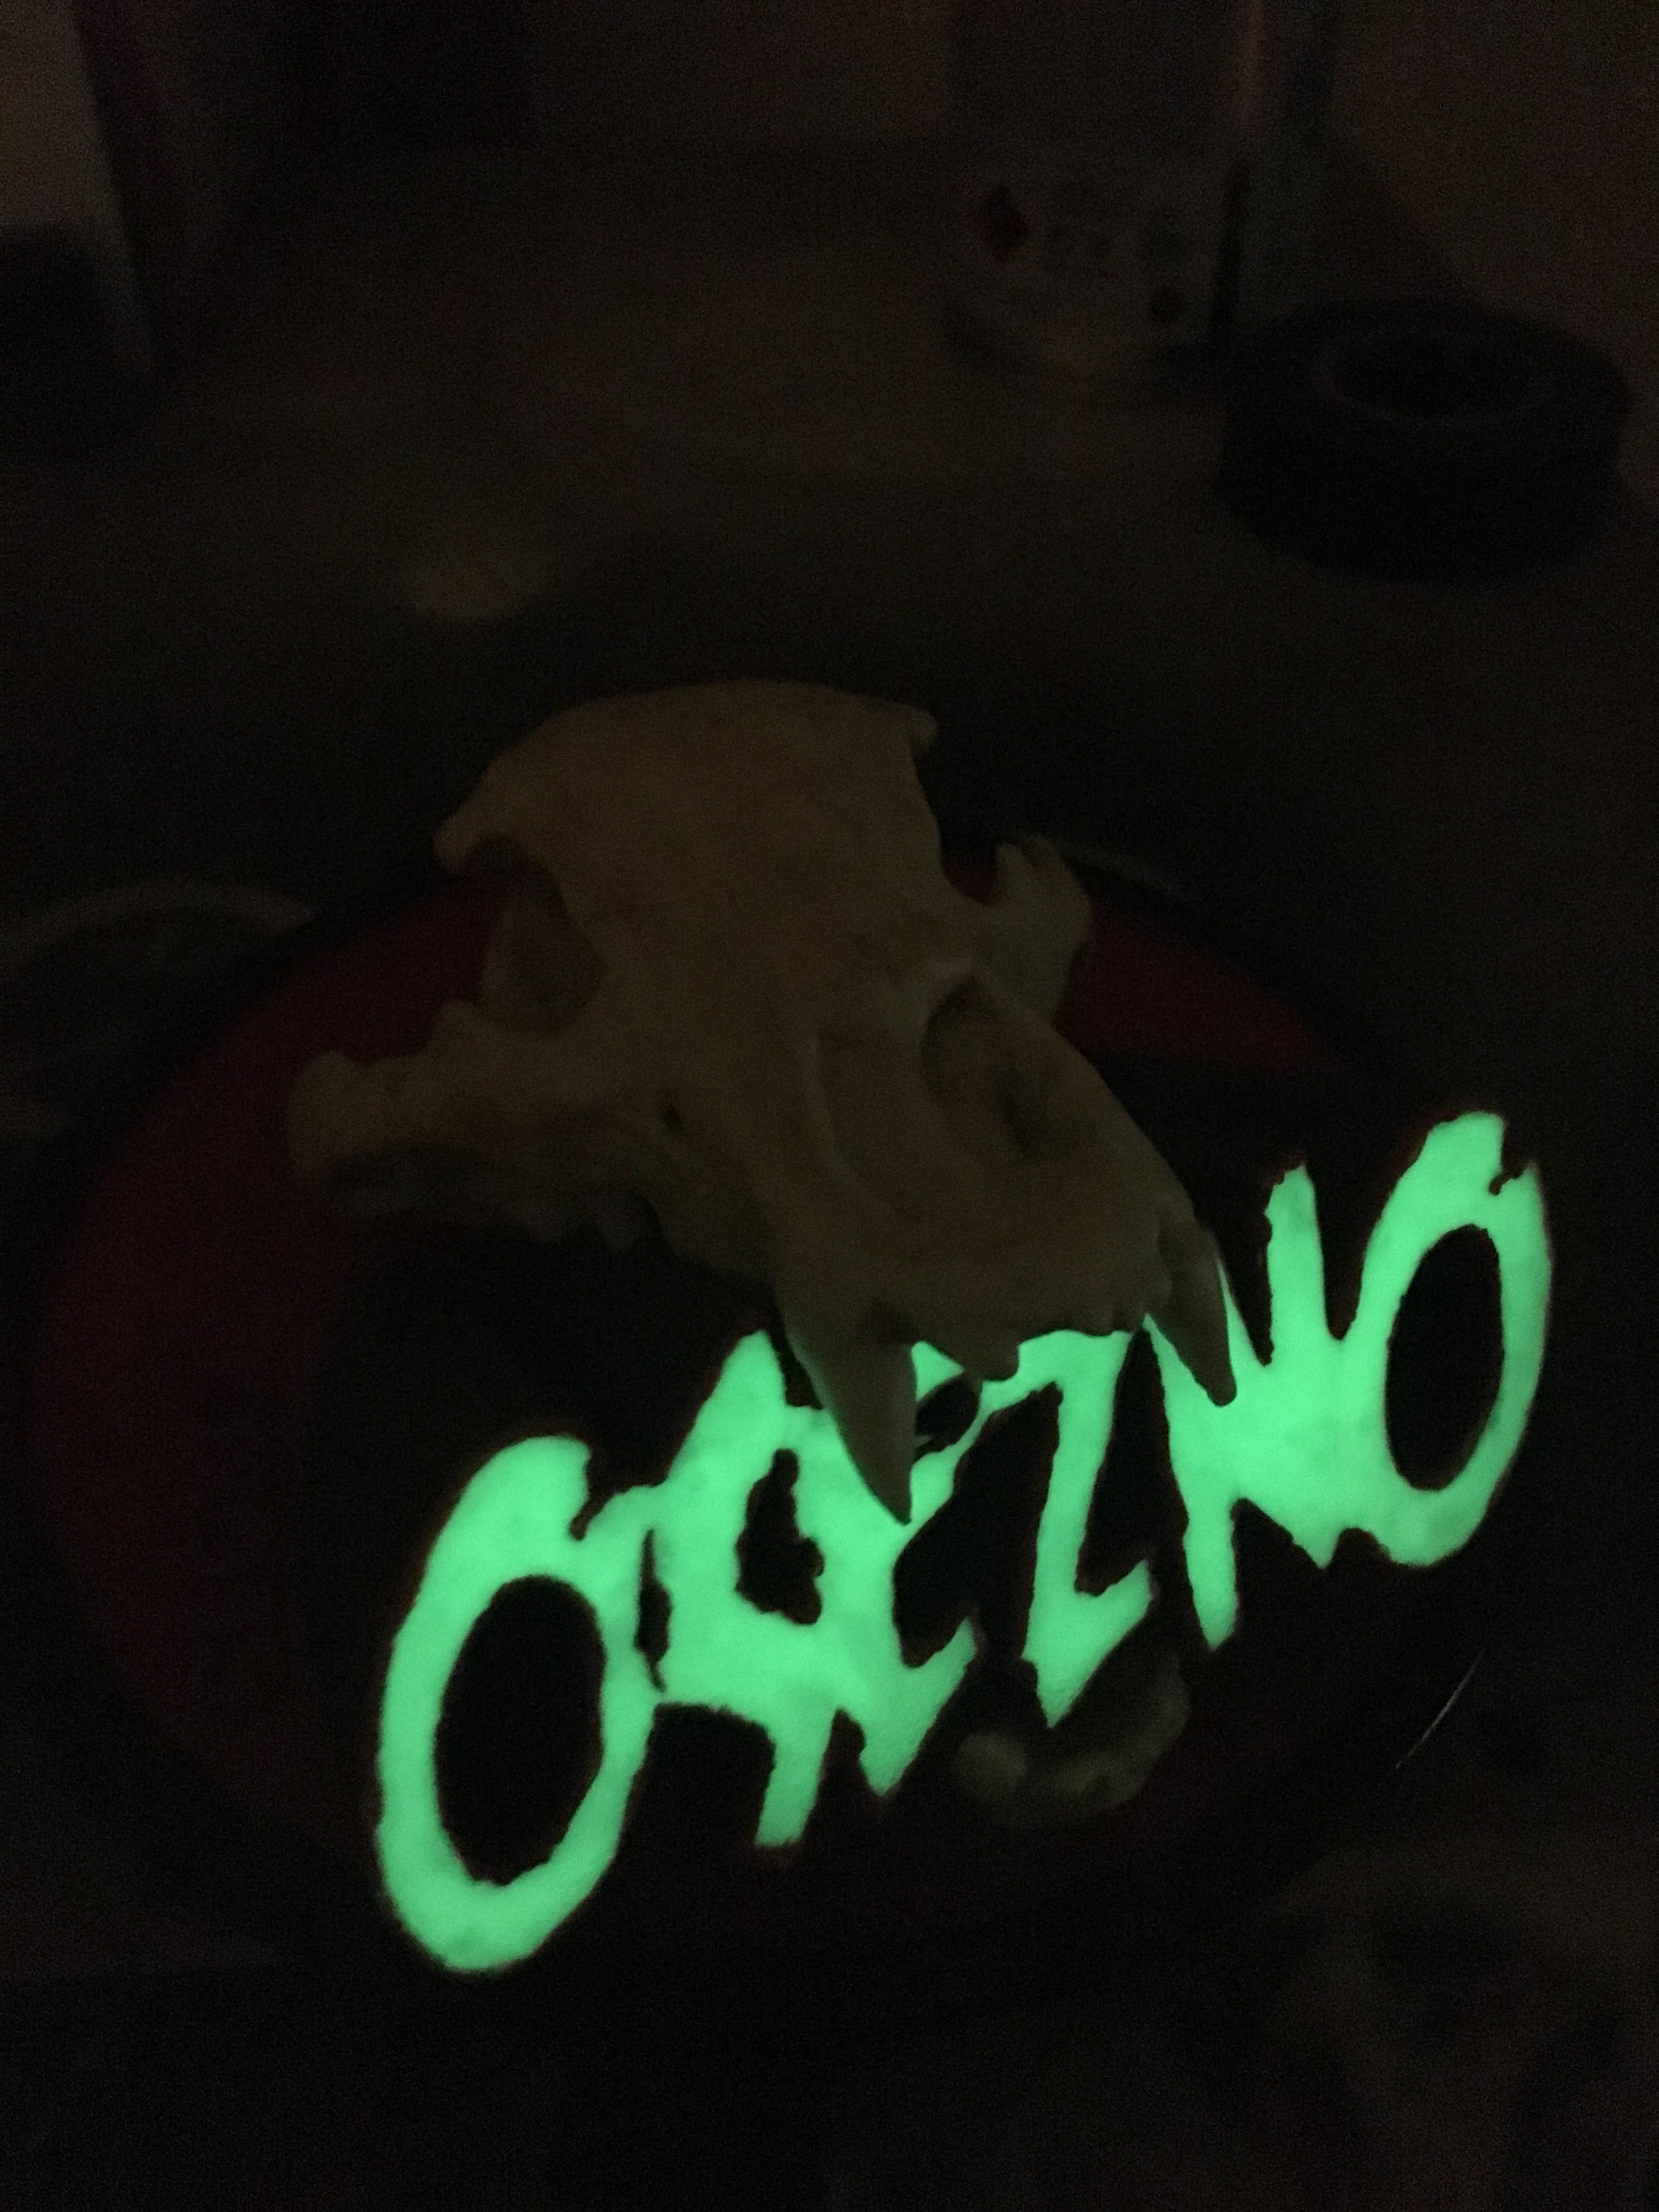 IMG_0277.JPG Download free STL file OSEZNO ROCK BAND LOGO • Object to 3D print, cloko